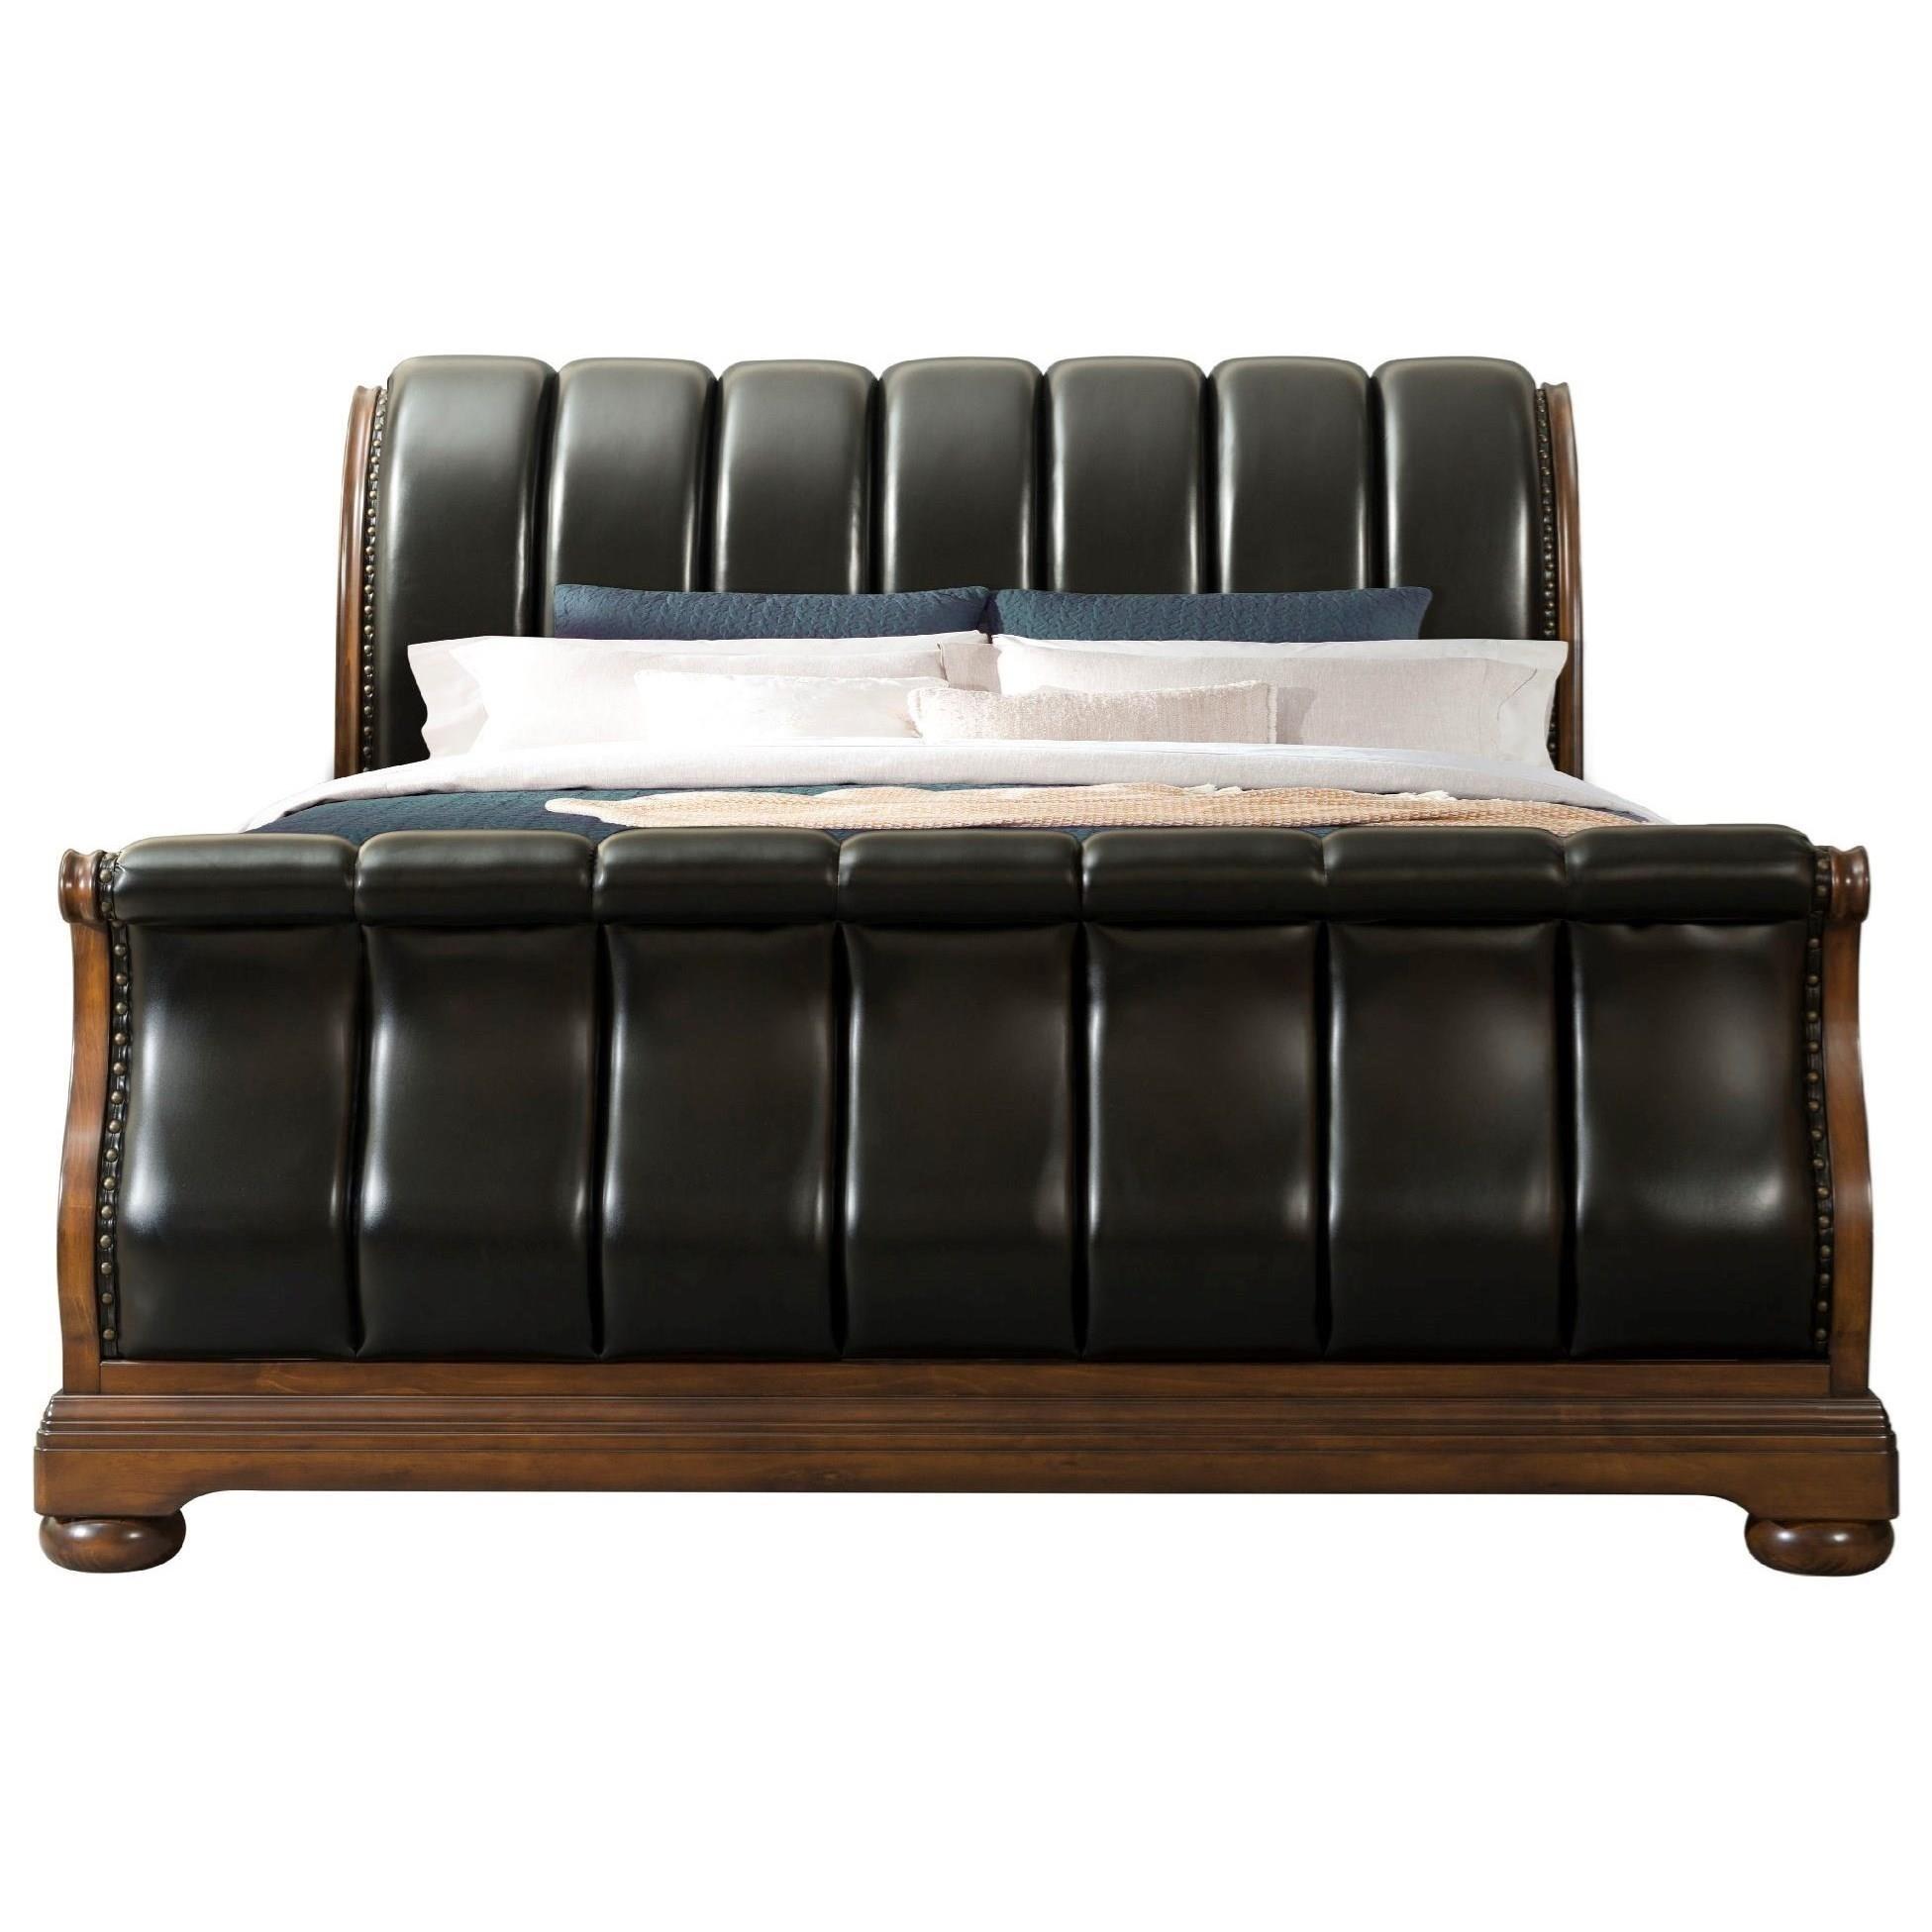 ashley furniture palmer sofa lancaster bed elements international queen sleigh miskelly